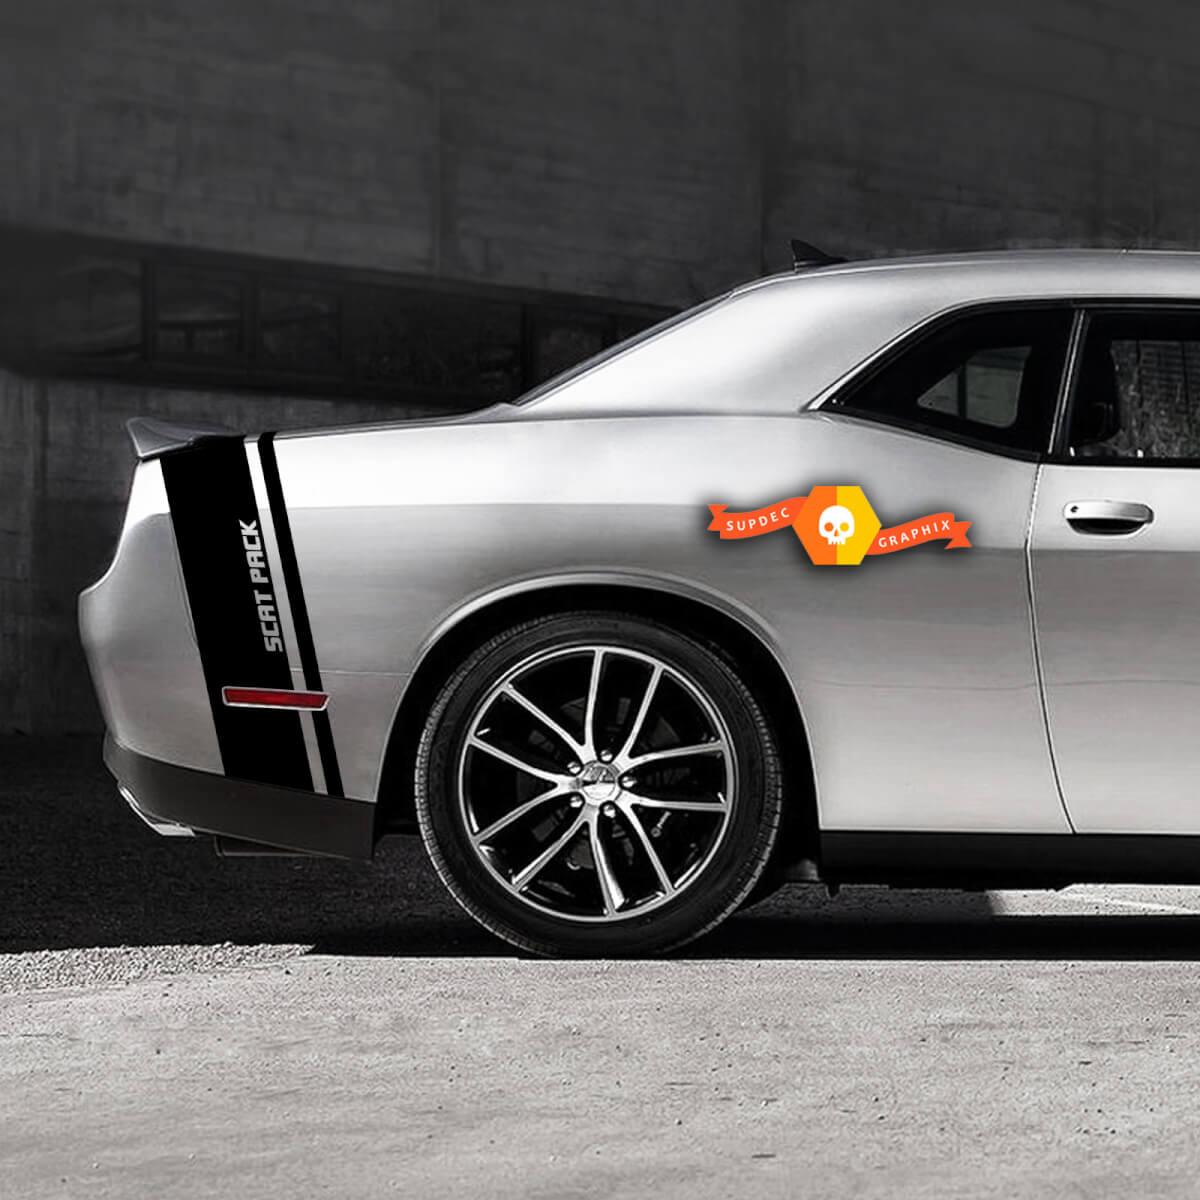 Dodge Challenger Scat Pack Schwanzband Aufkleber Grafik passt zu Modellen